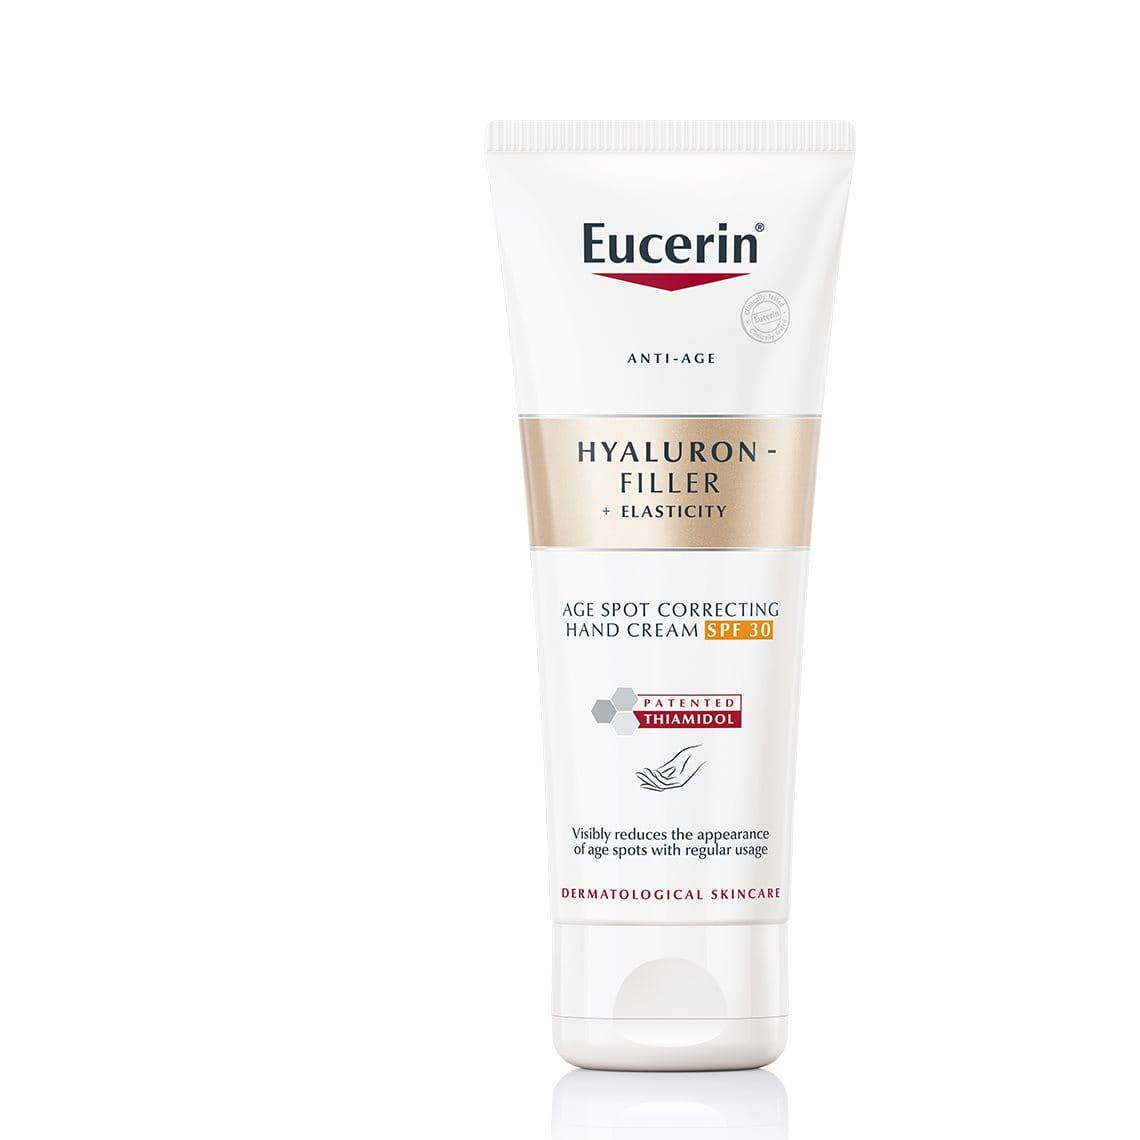 Hyaluron-Filler + Elasticity Hand Cream